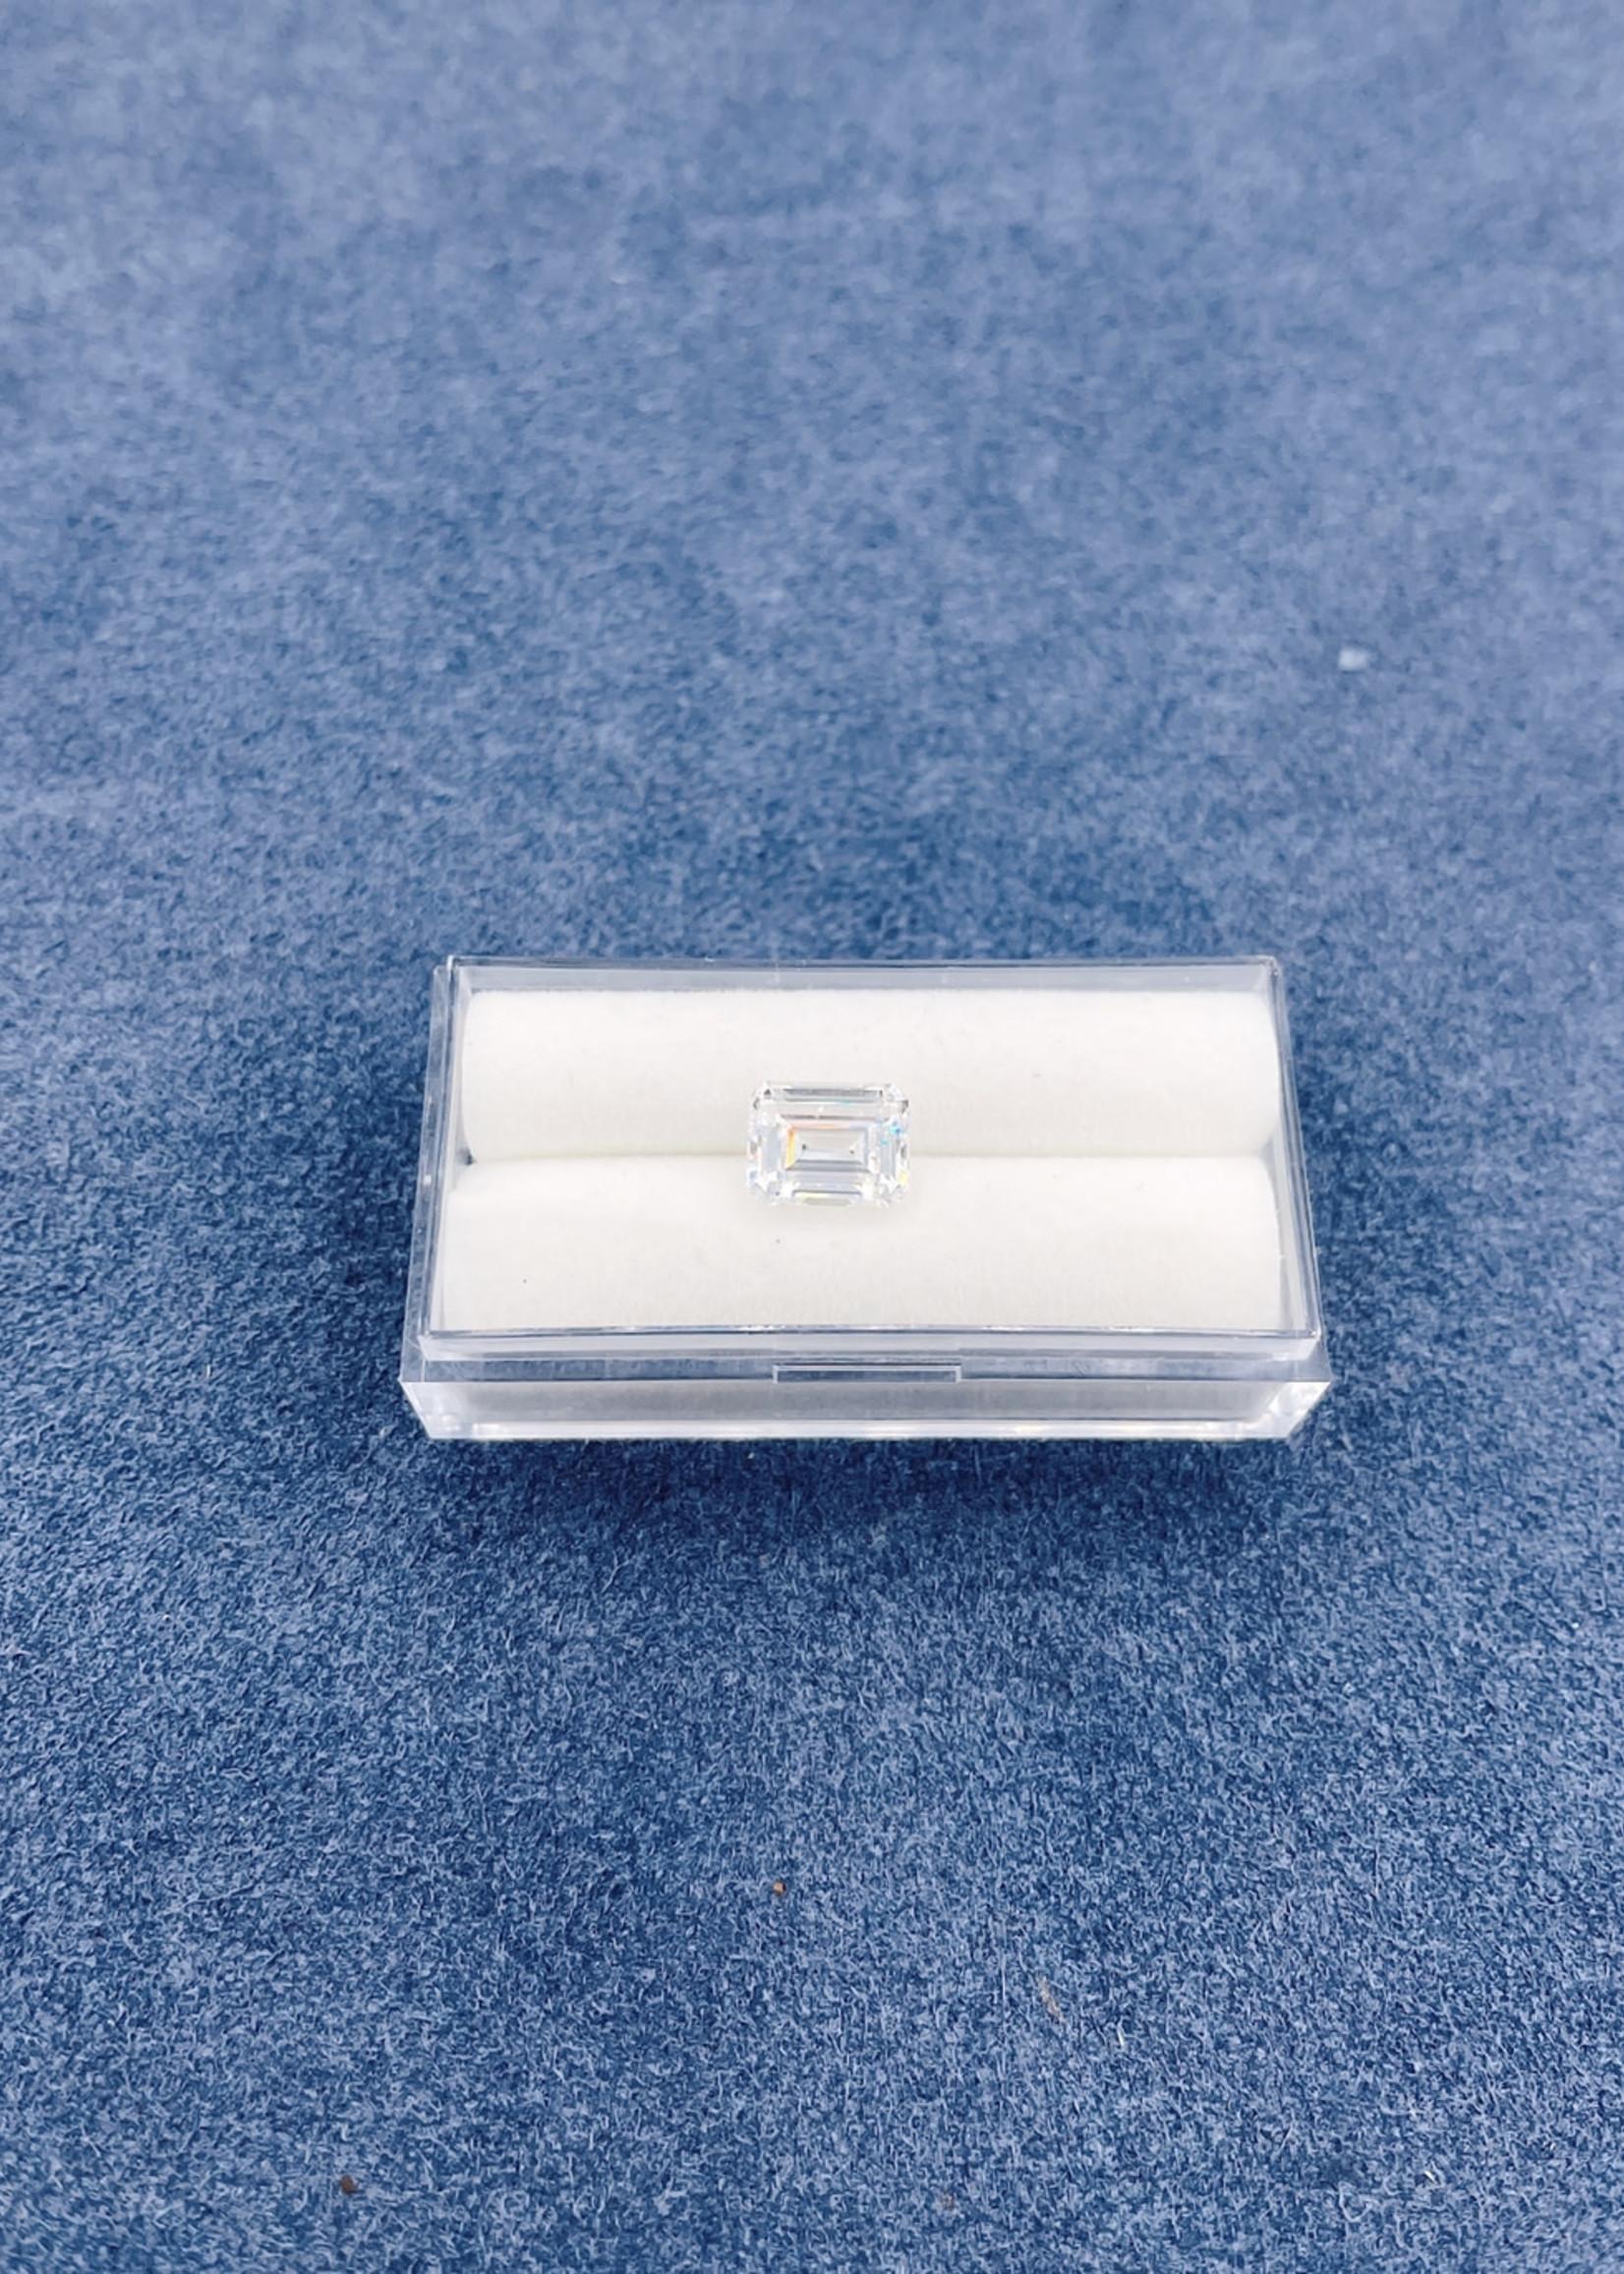 Lannyte Lannyte Emerald Cut 4.50cts 9x7mm White